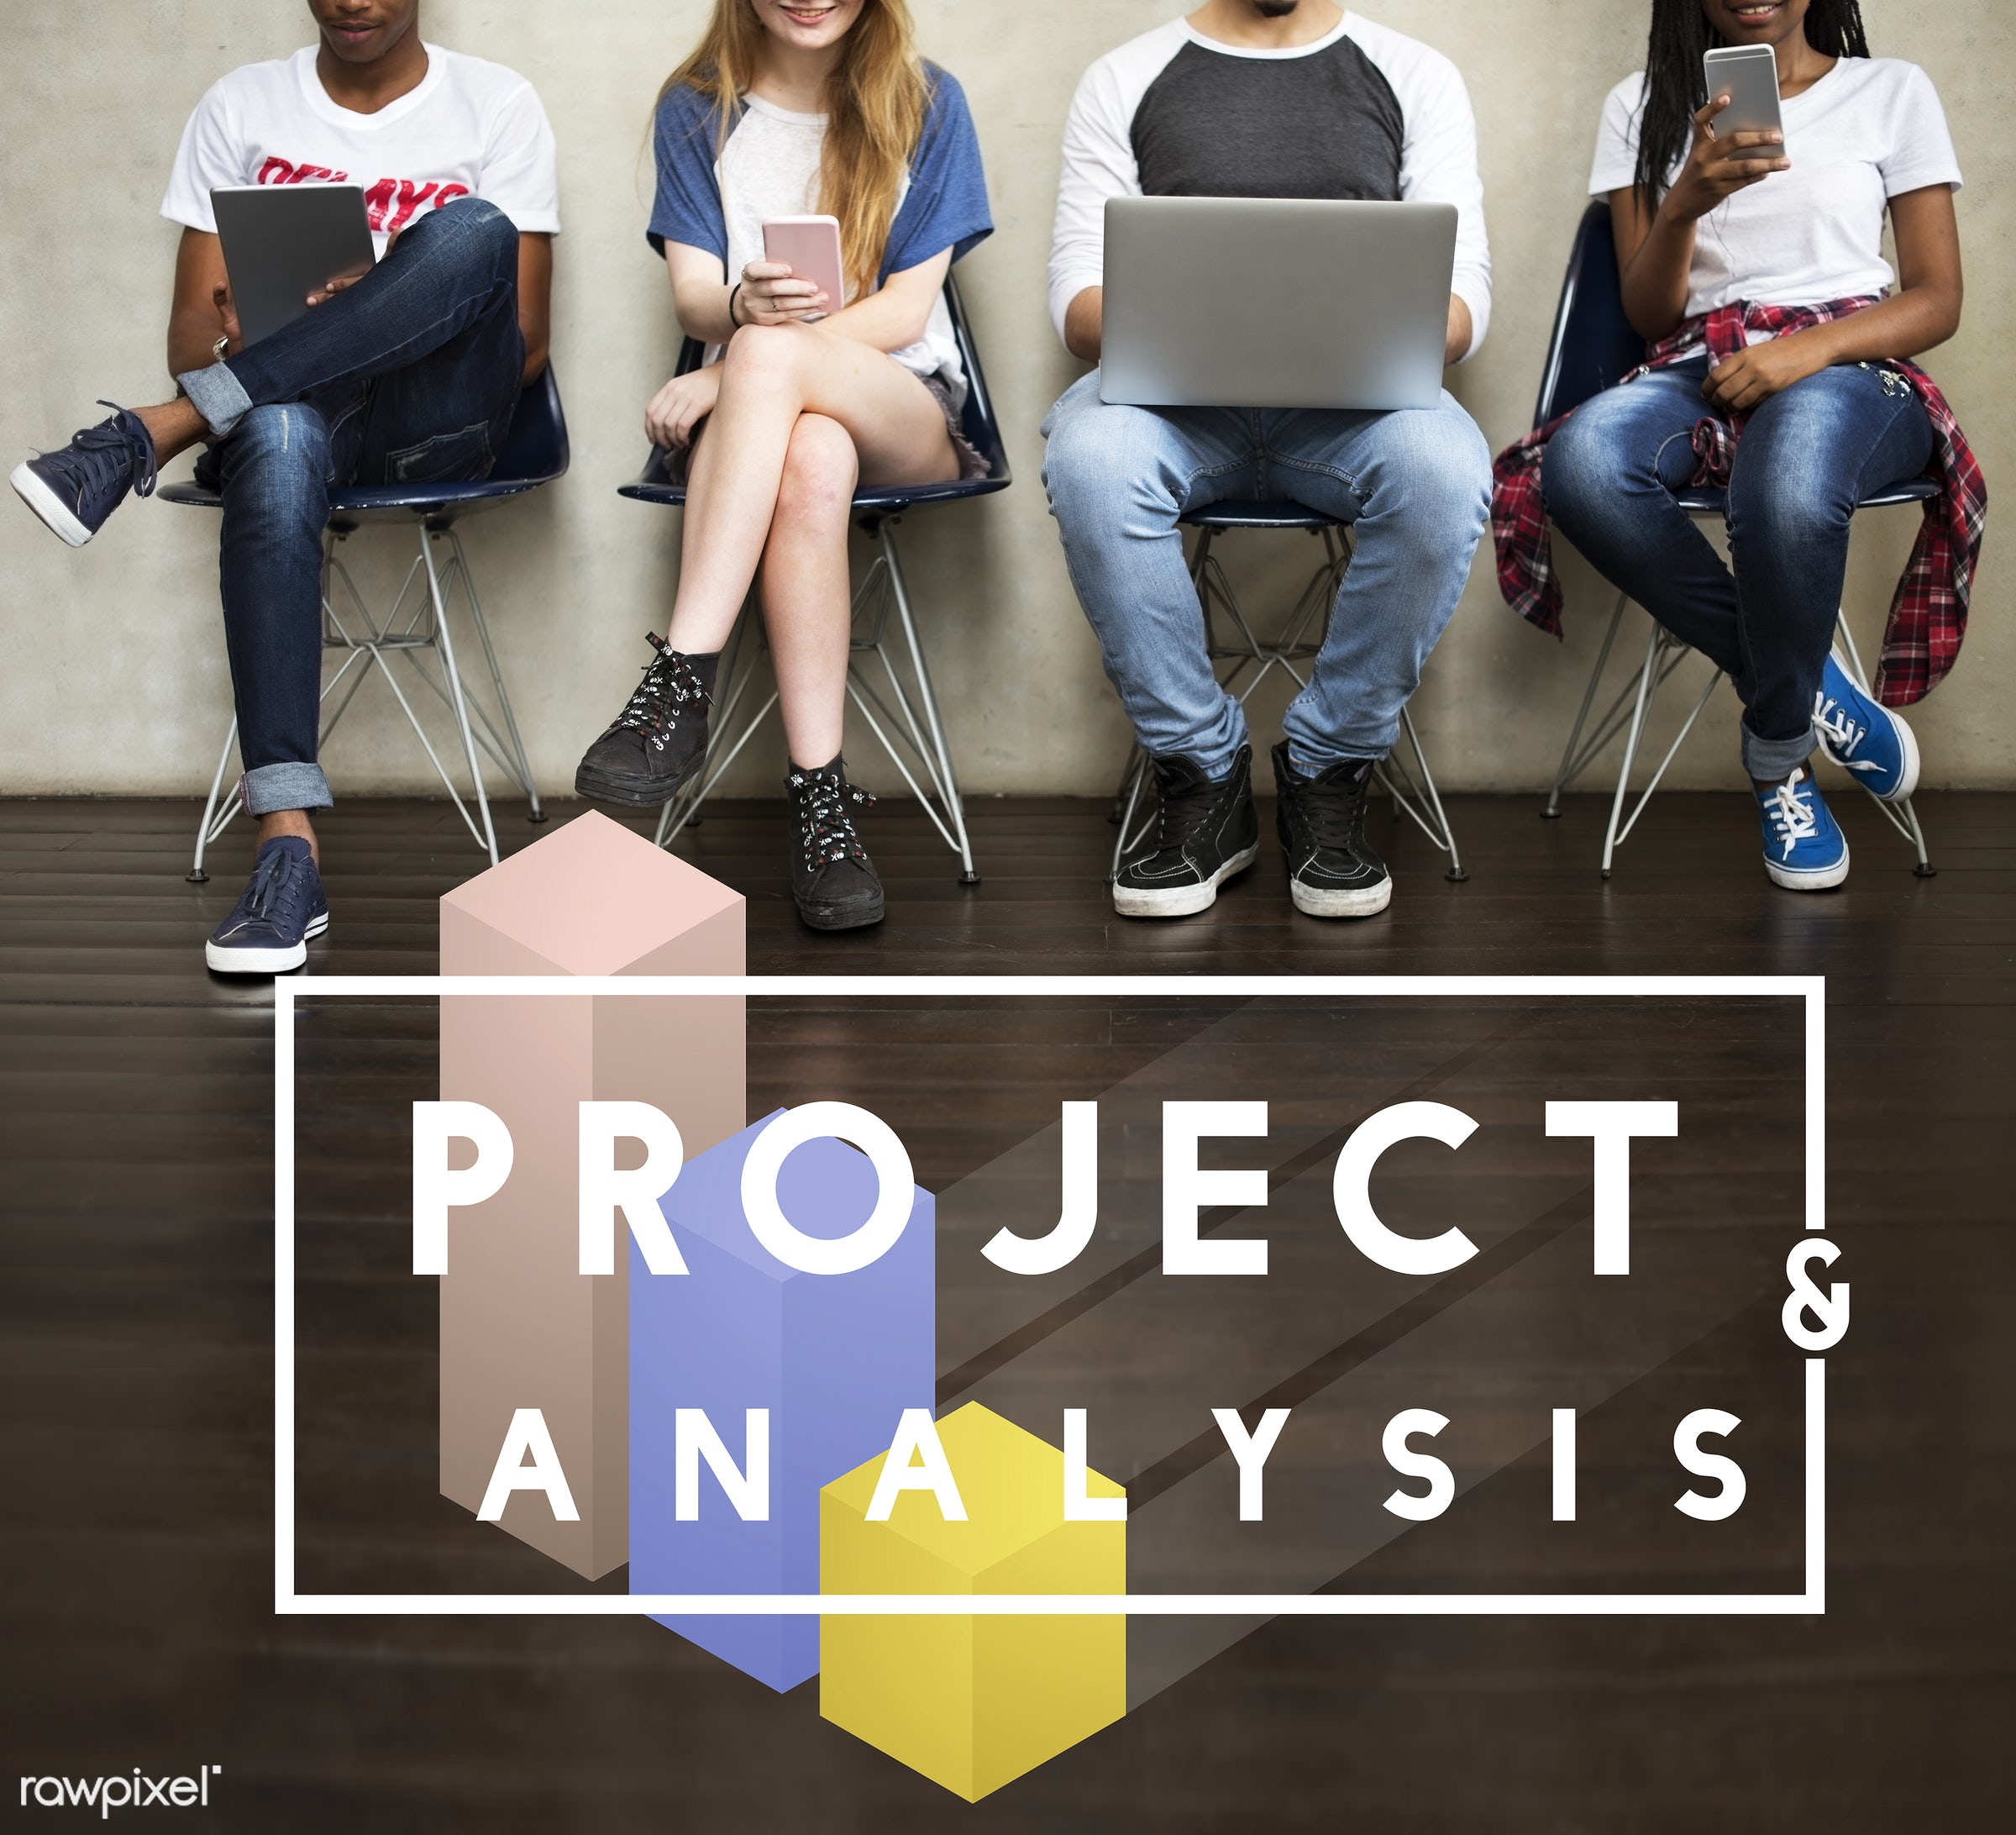 african descent, analysis, analytics, analyze, asian, caucasian, creativity, data, data analysis, devices, digital devices,...